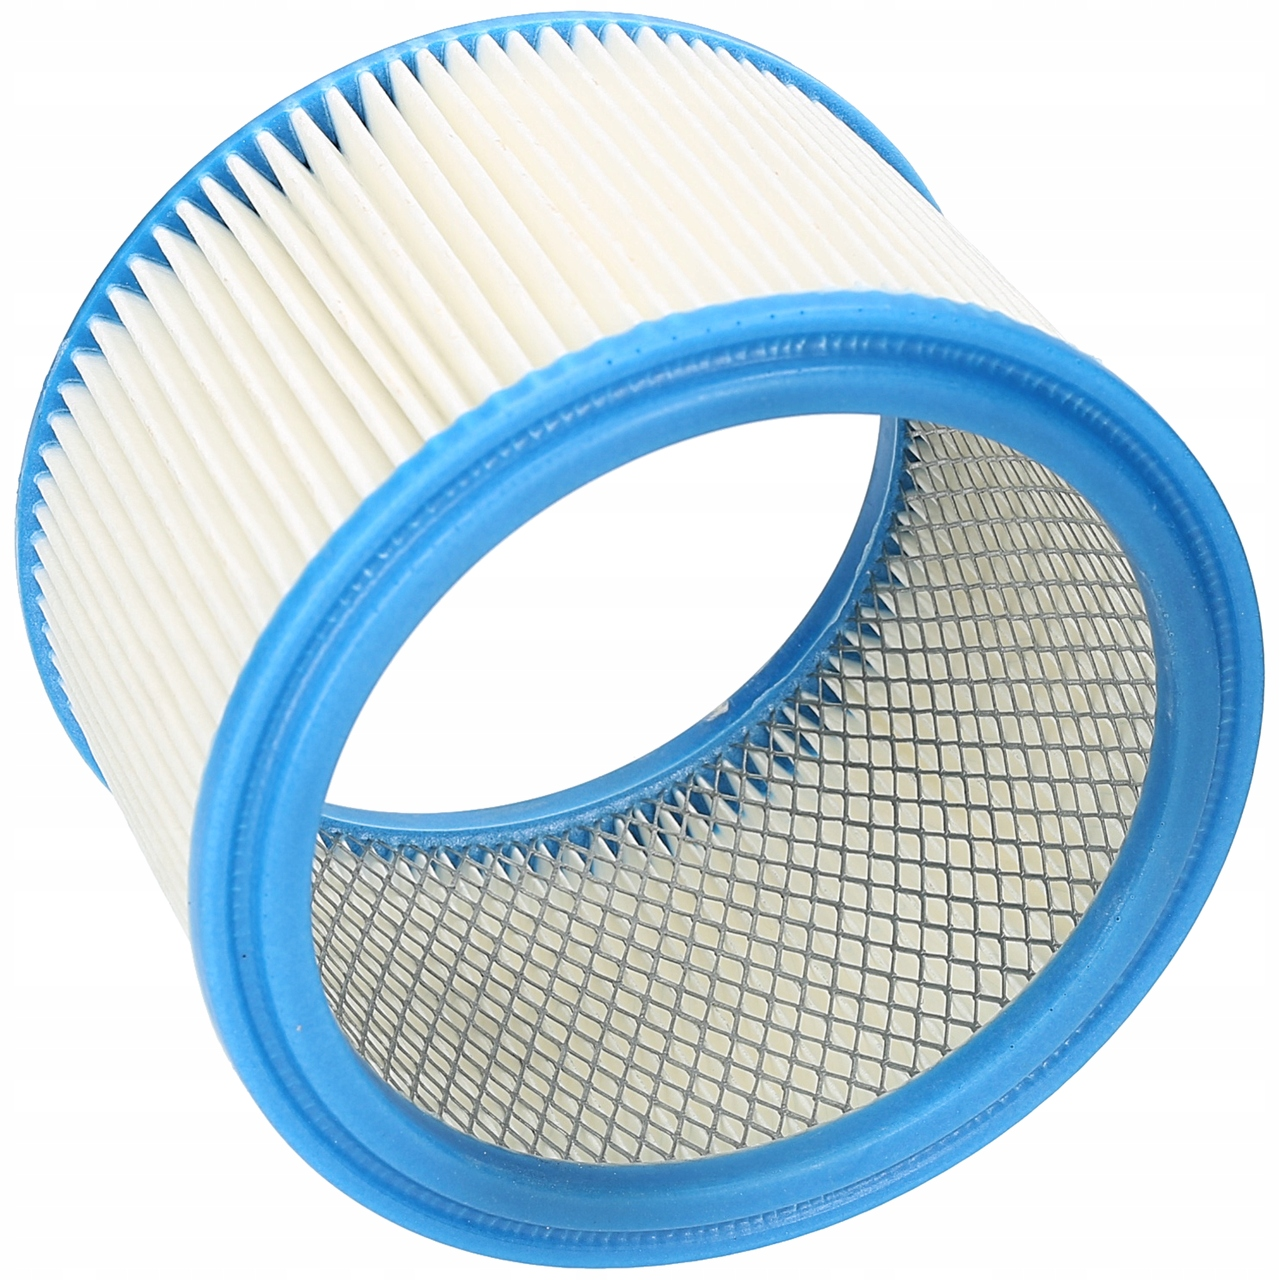 Kónický filter pre vysávač Sparky VC 1650MS